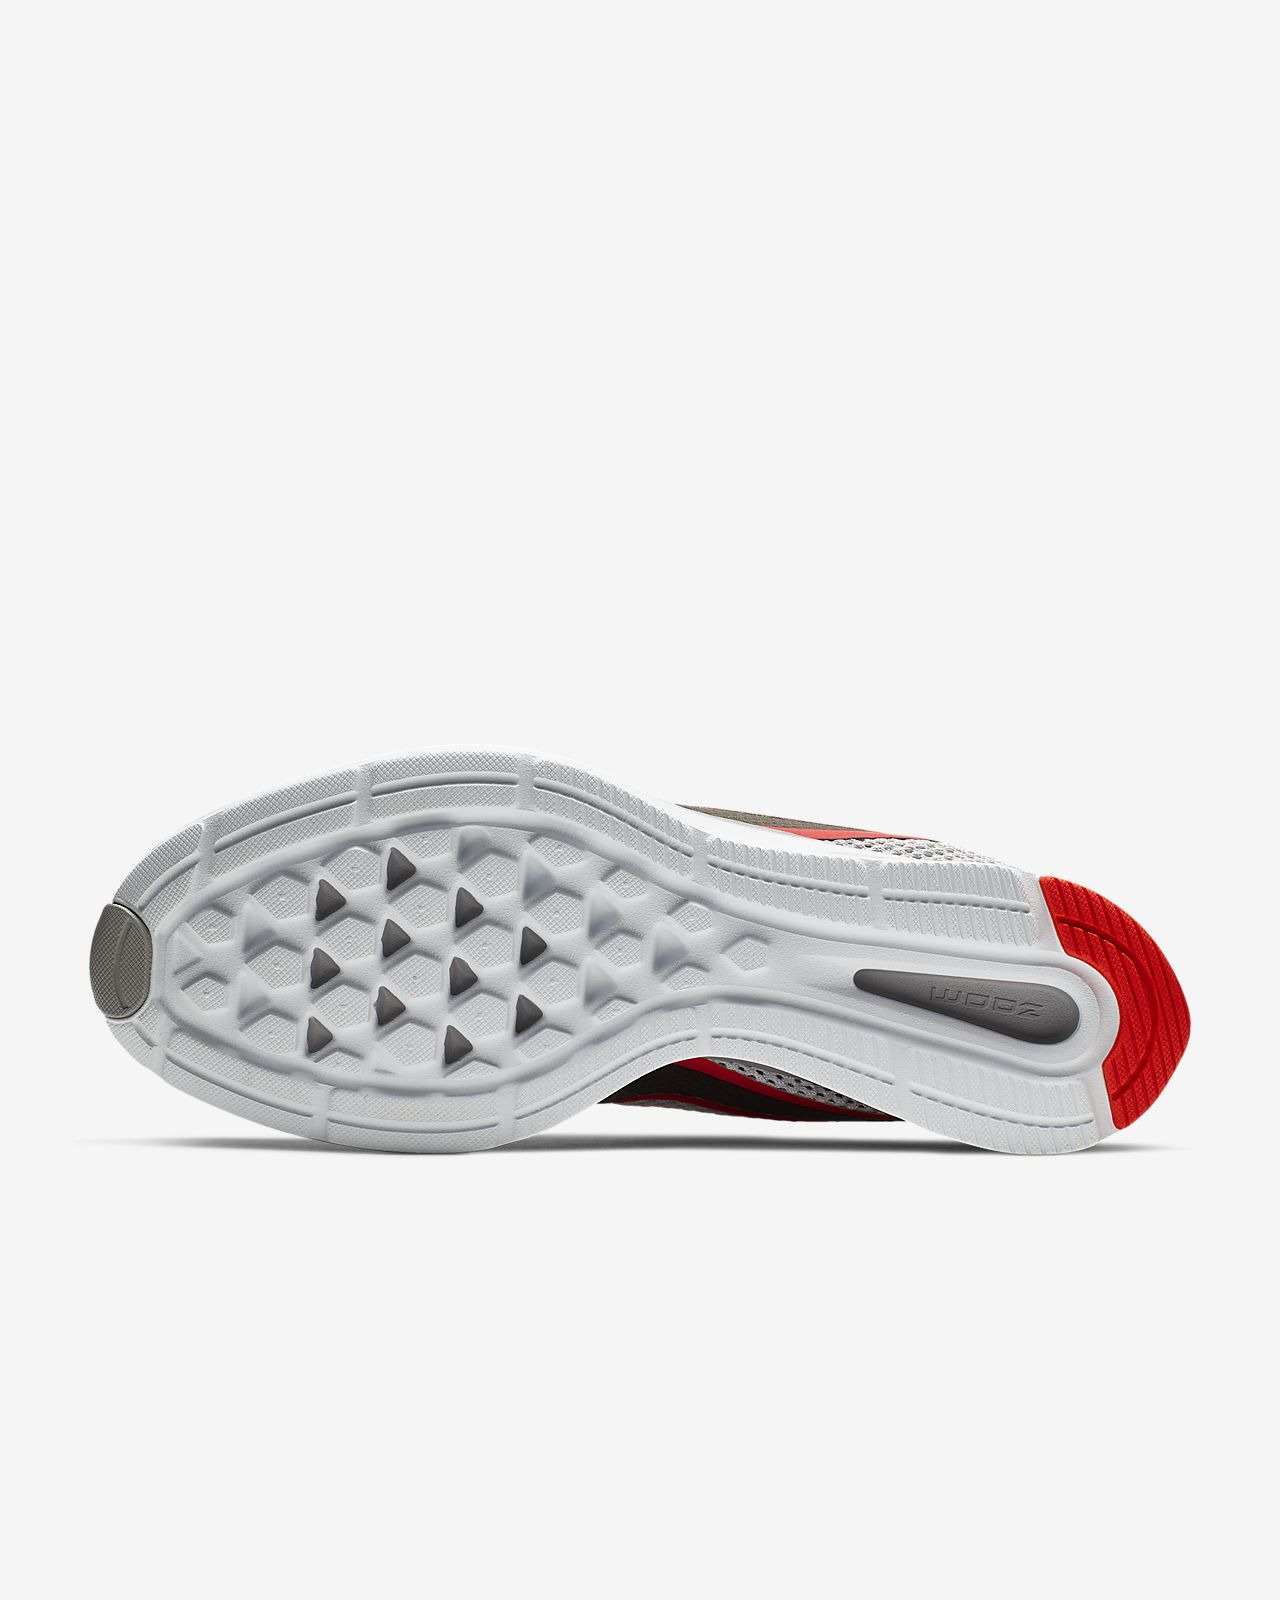 Pour Chaussure Running HommeFr Strike 2 Zoom Nike De DYIHEW29e